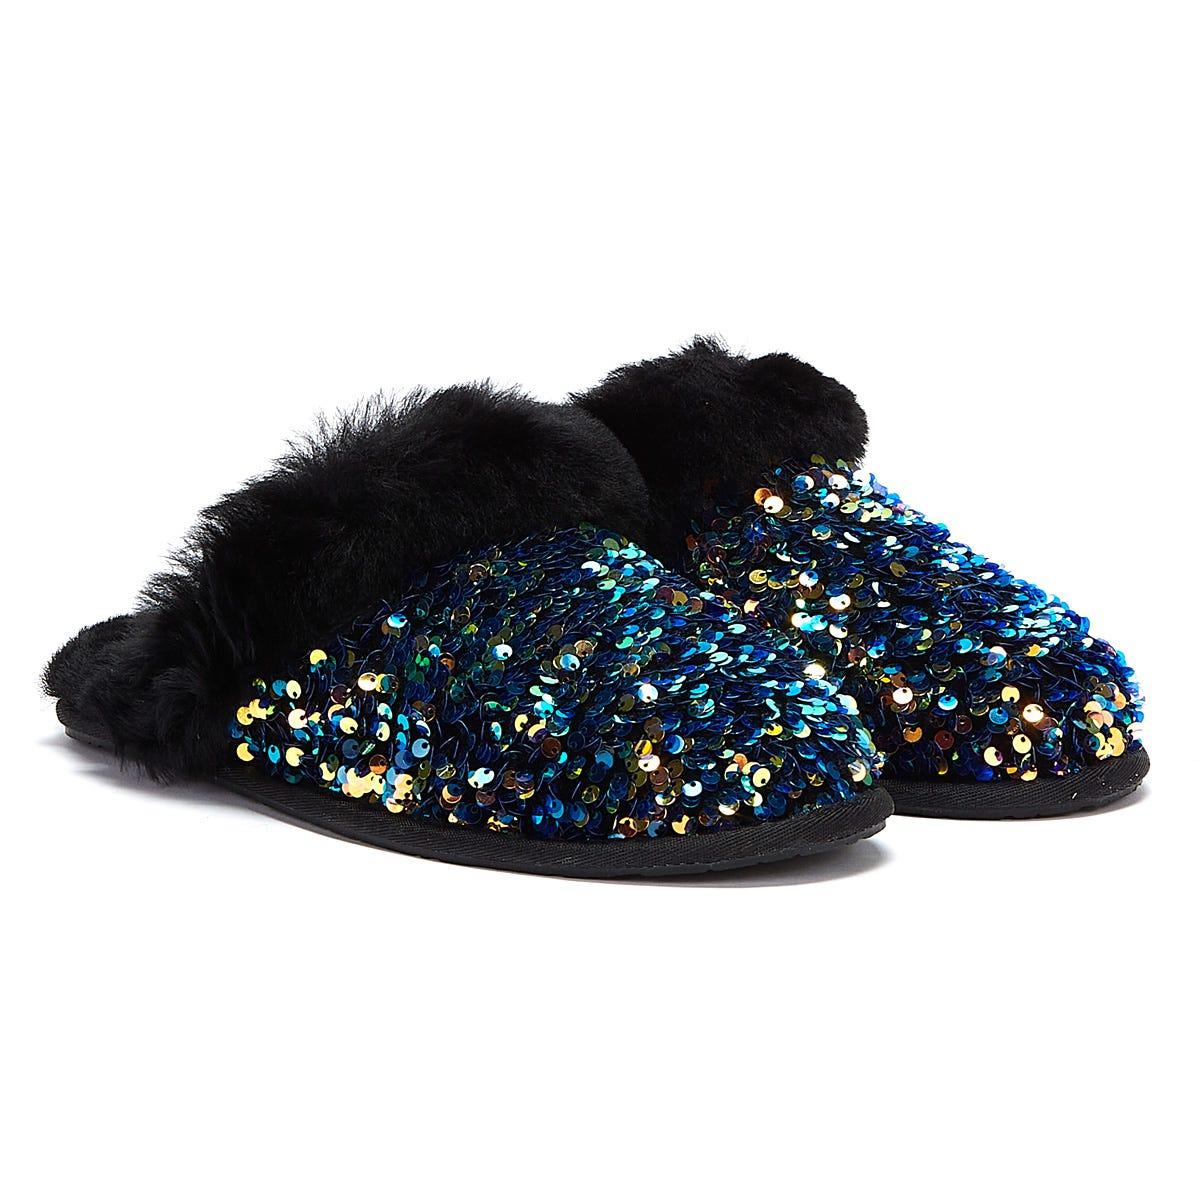 UGG Scuffette II Stellar Sequin Womens Black Slippers UK 3